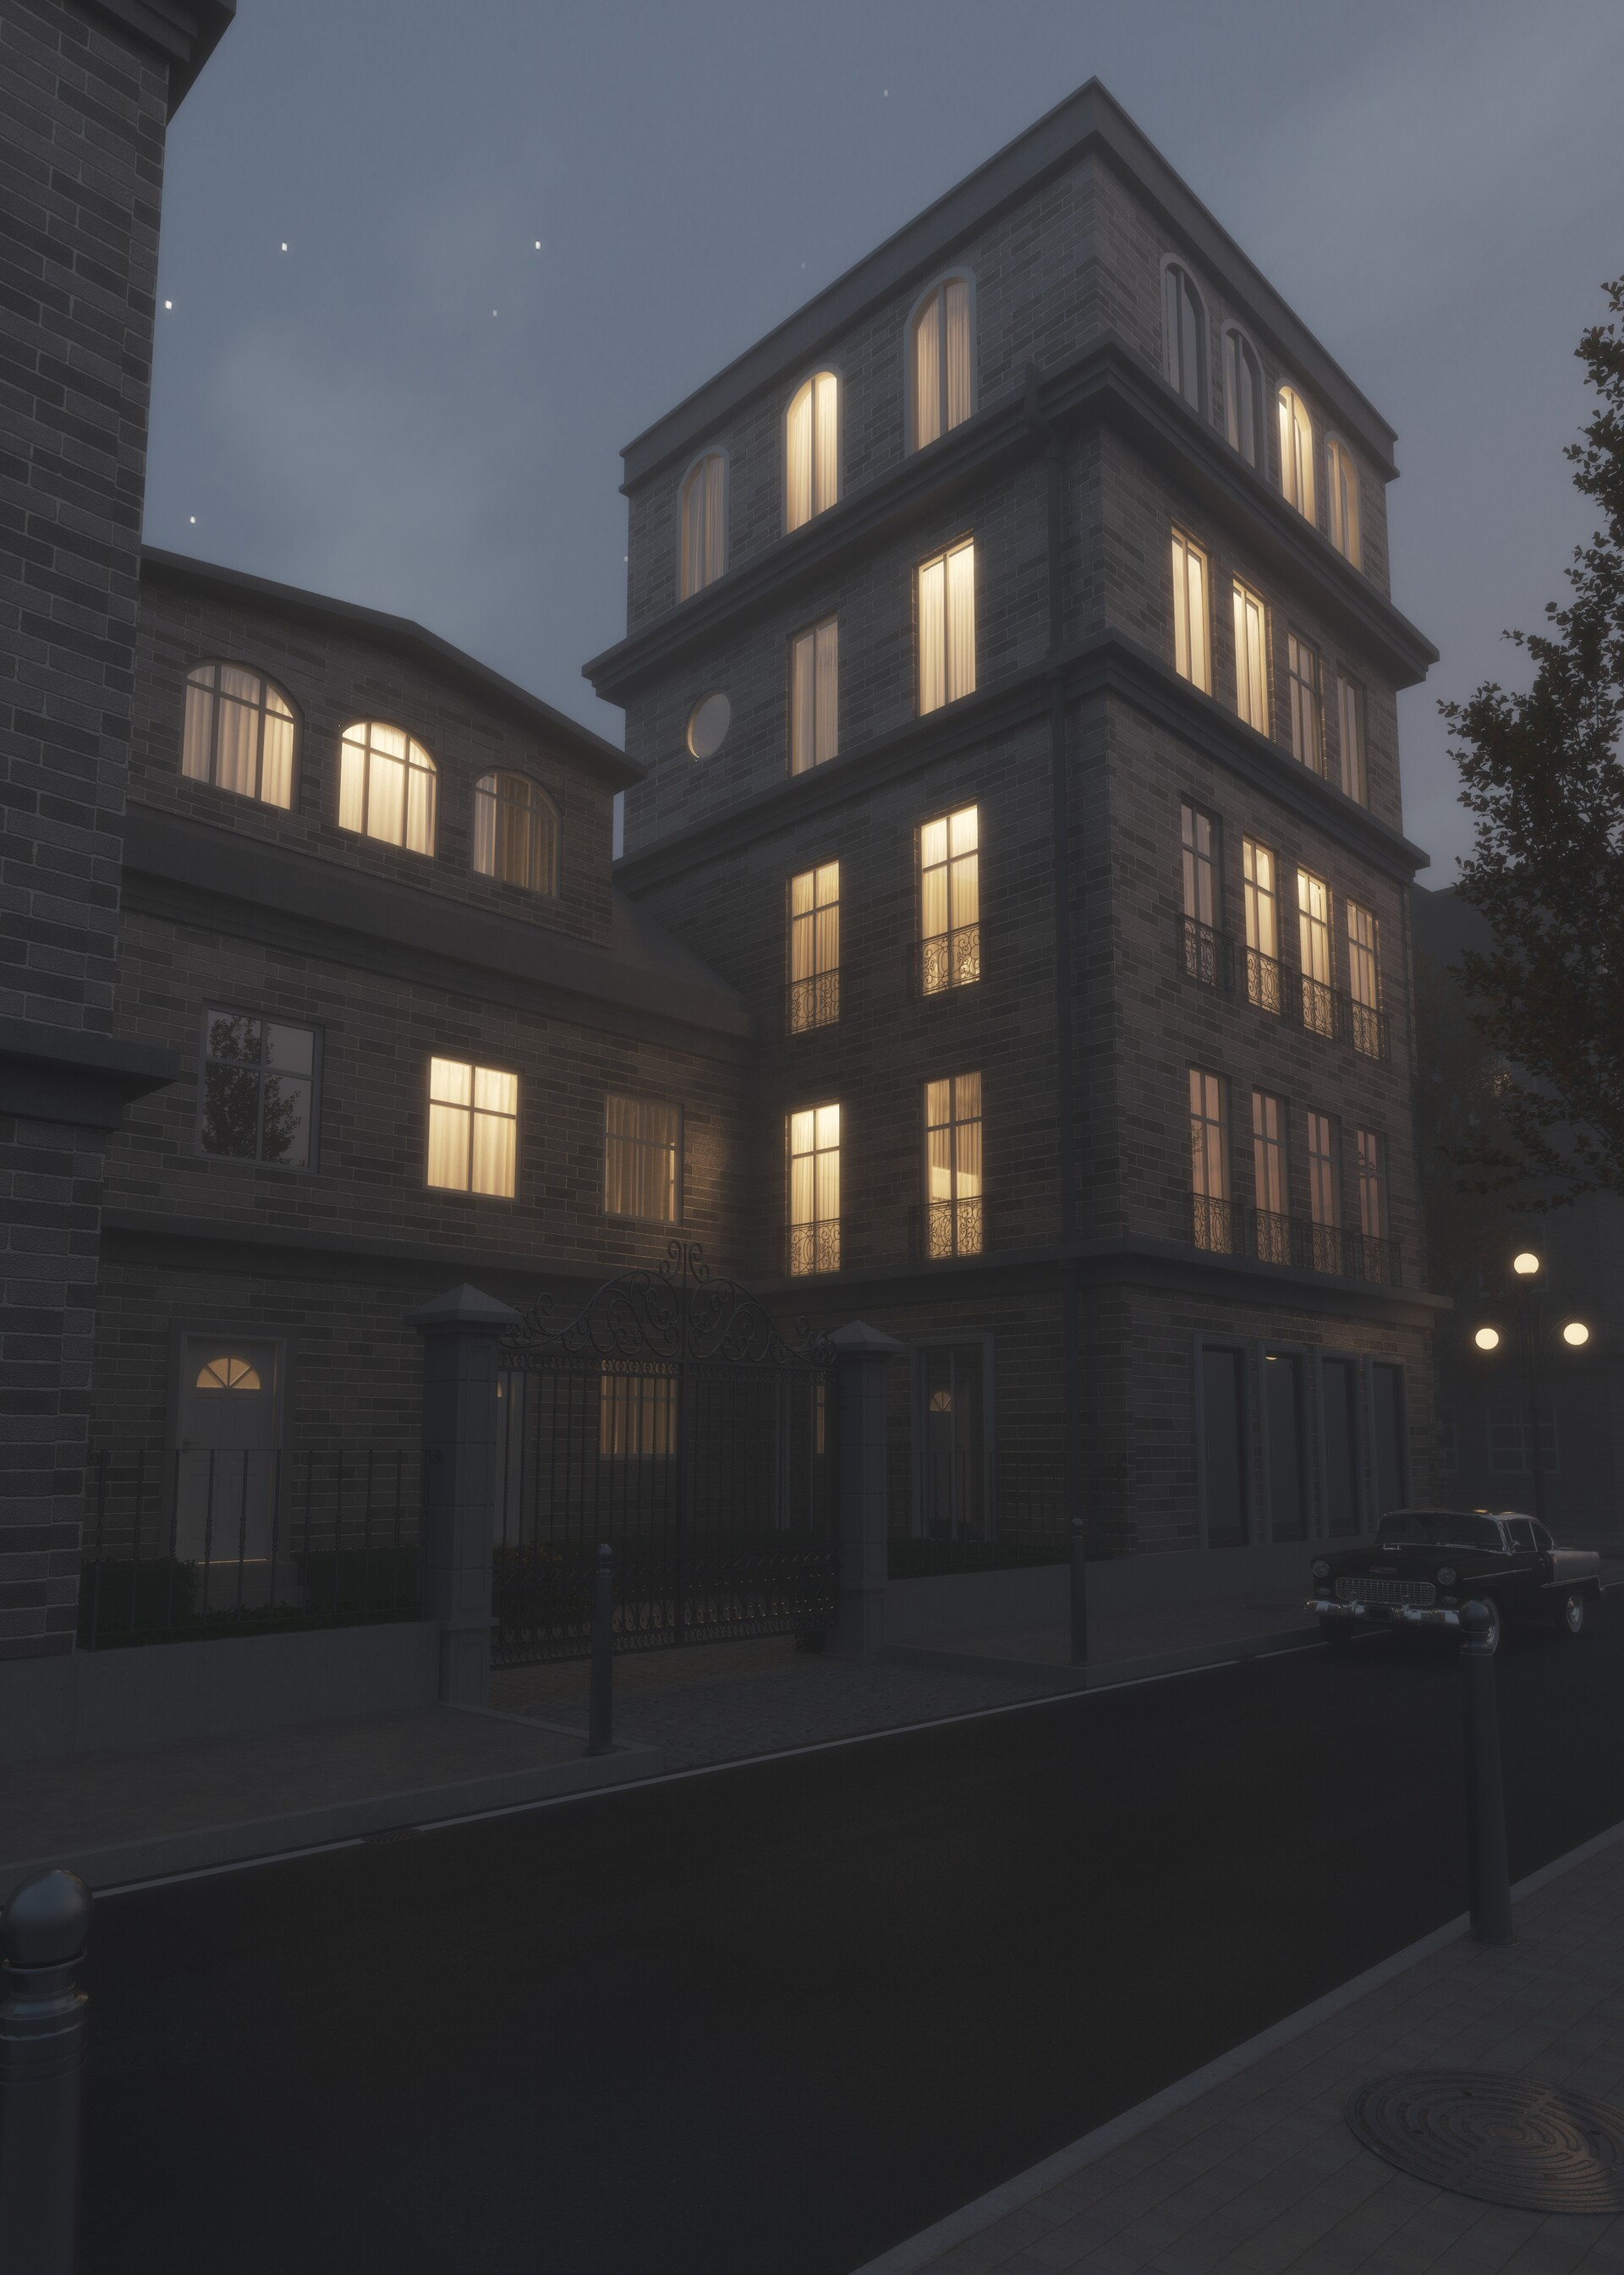 ArtStation - Night Views - Exterior renders, Valmik Shah